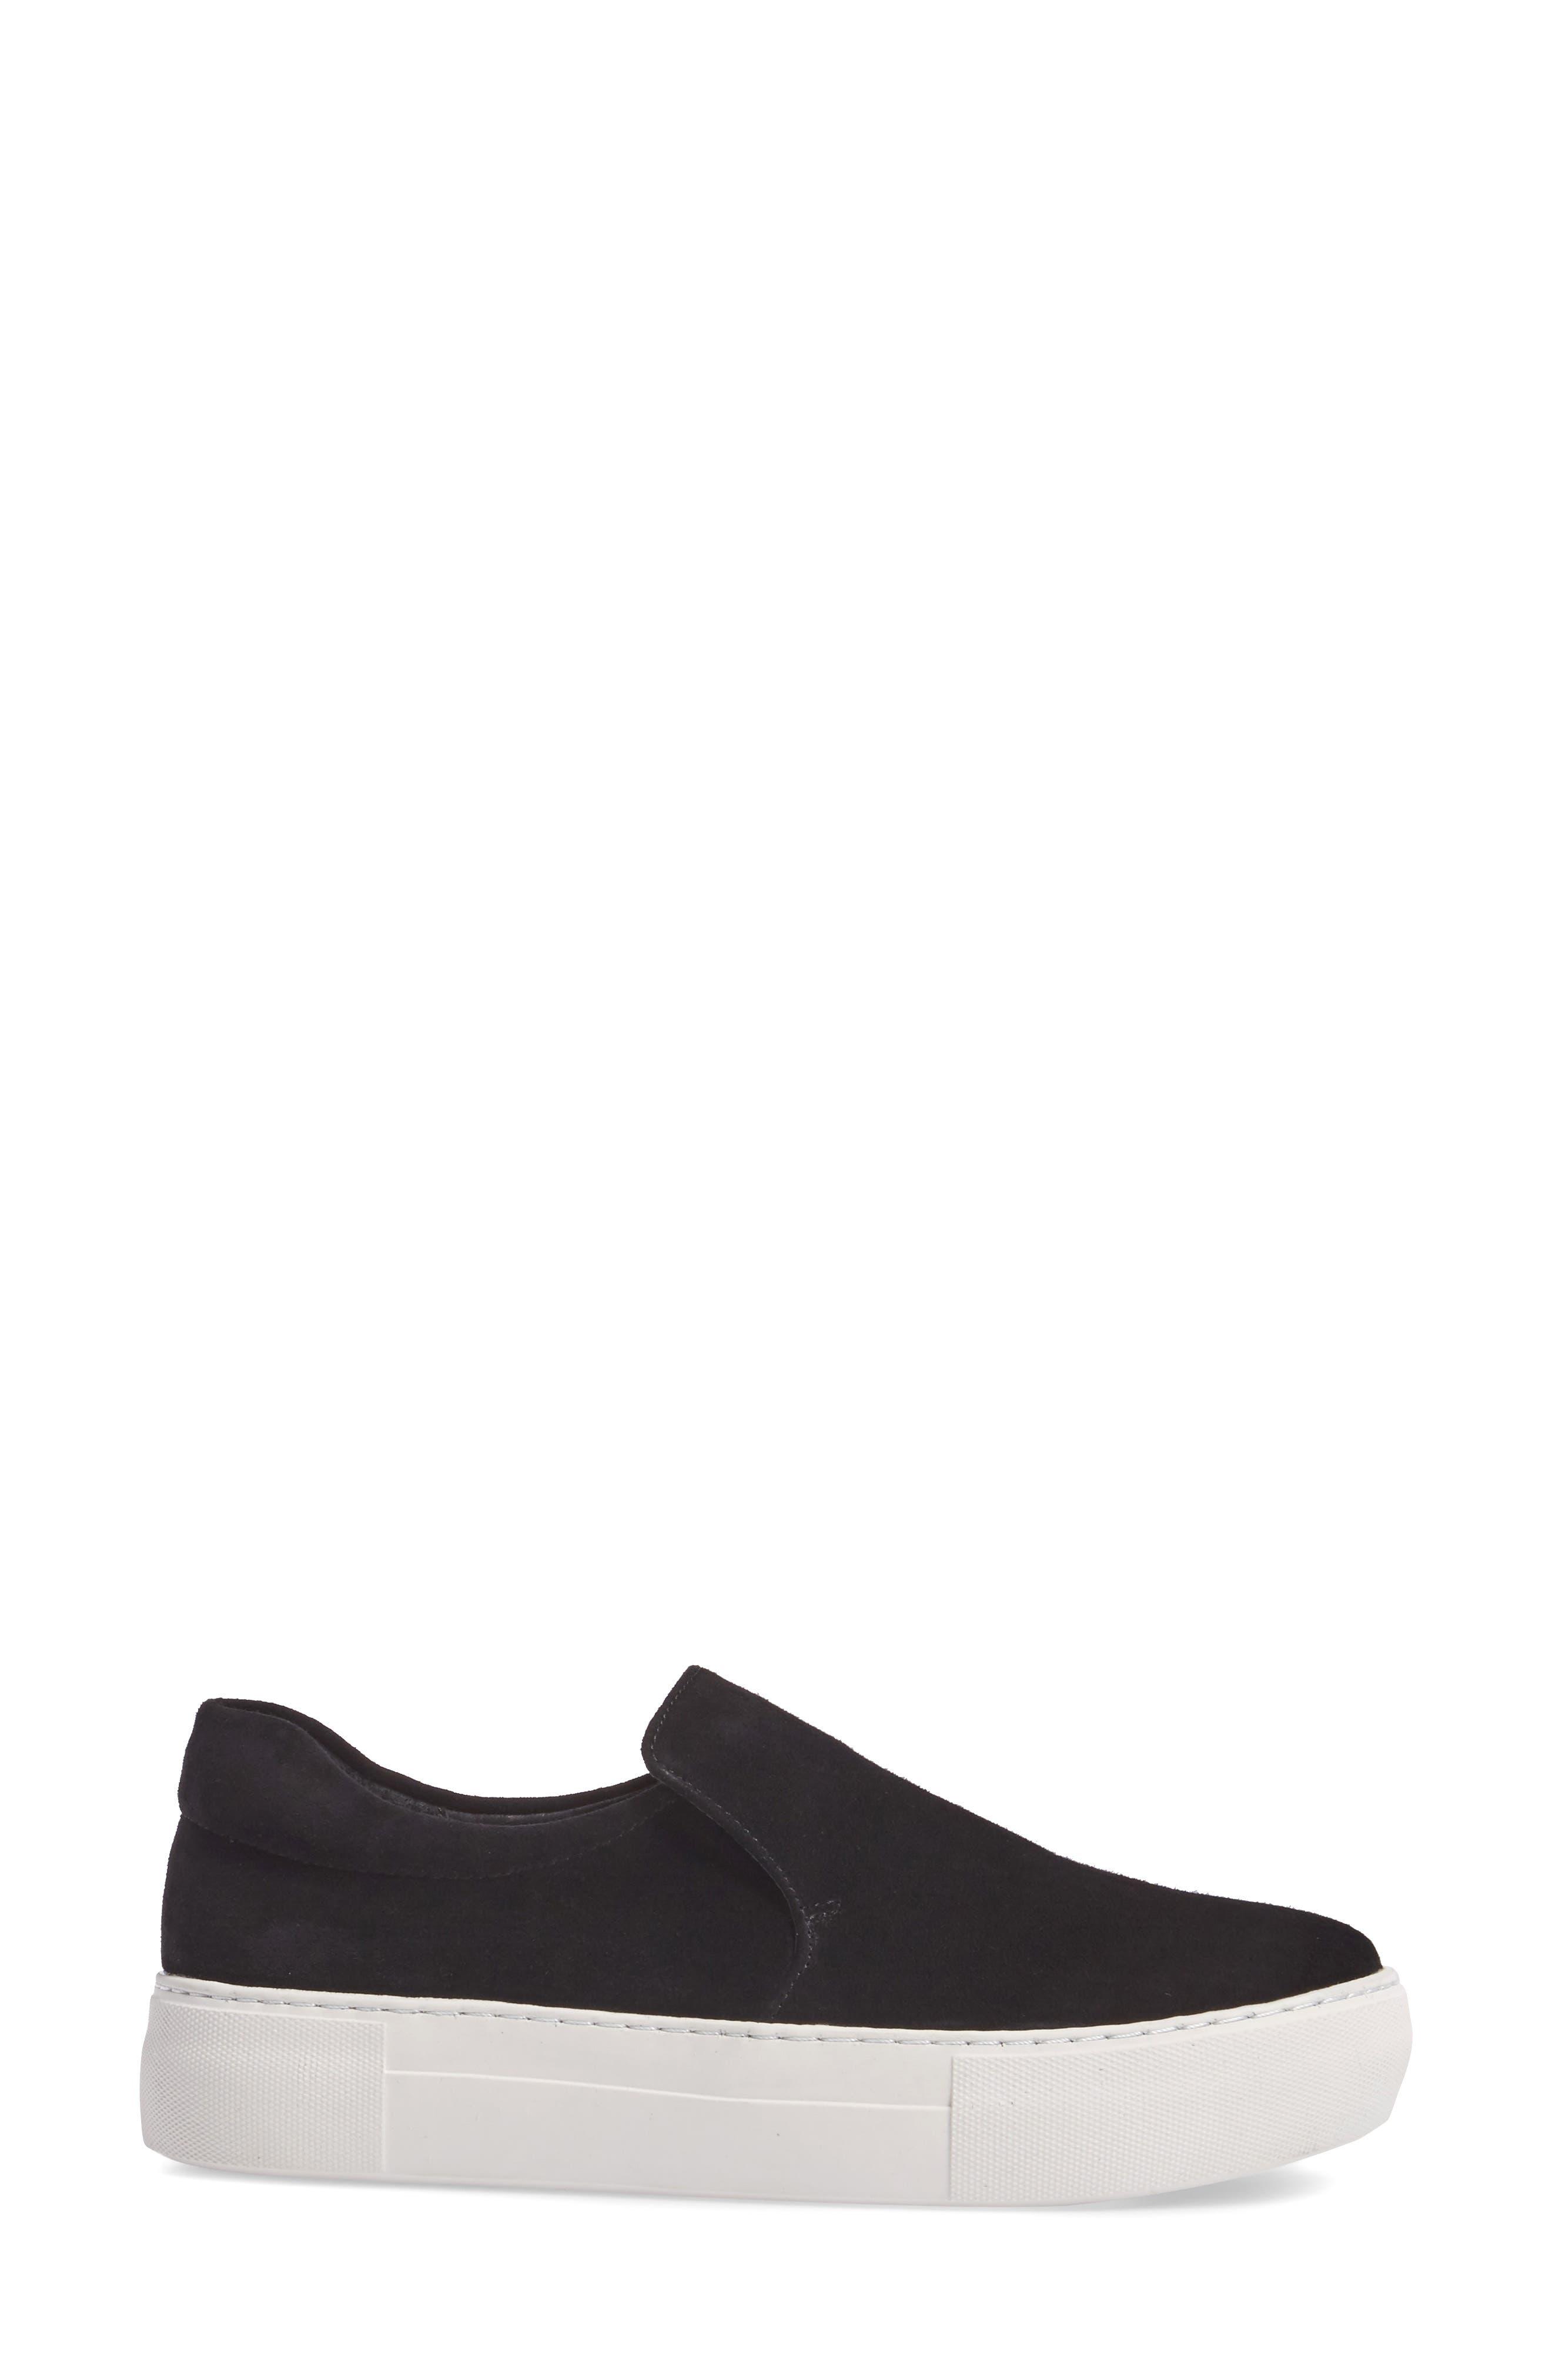 Acer Slip-On Sneaker,                             Alternate thumbnail 3, color,                             BLACK SUEDE